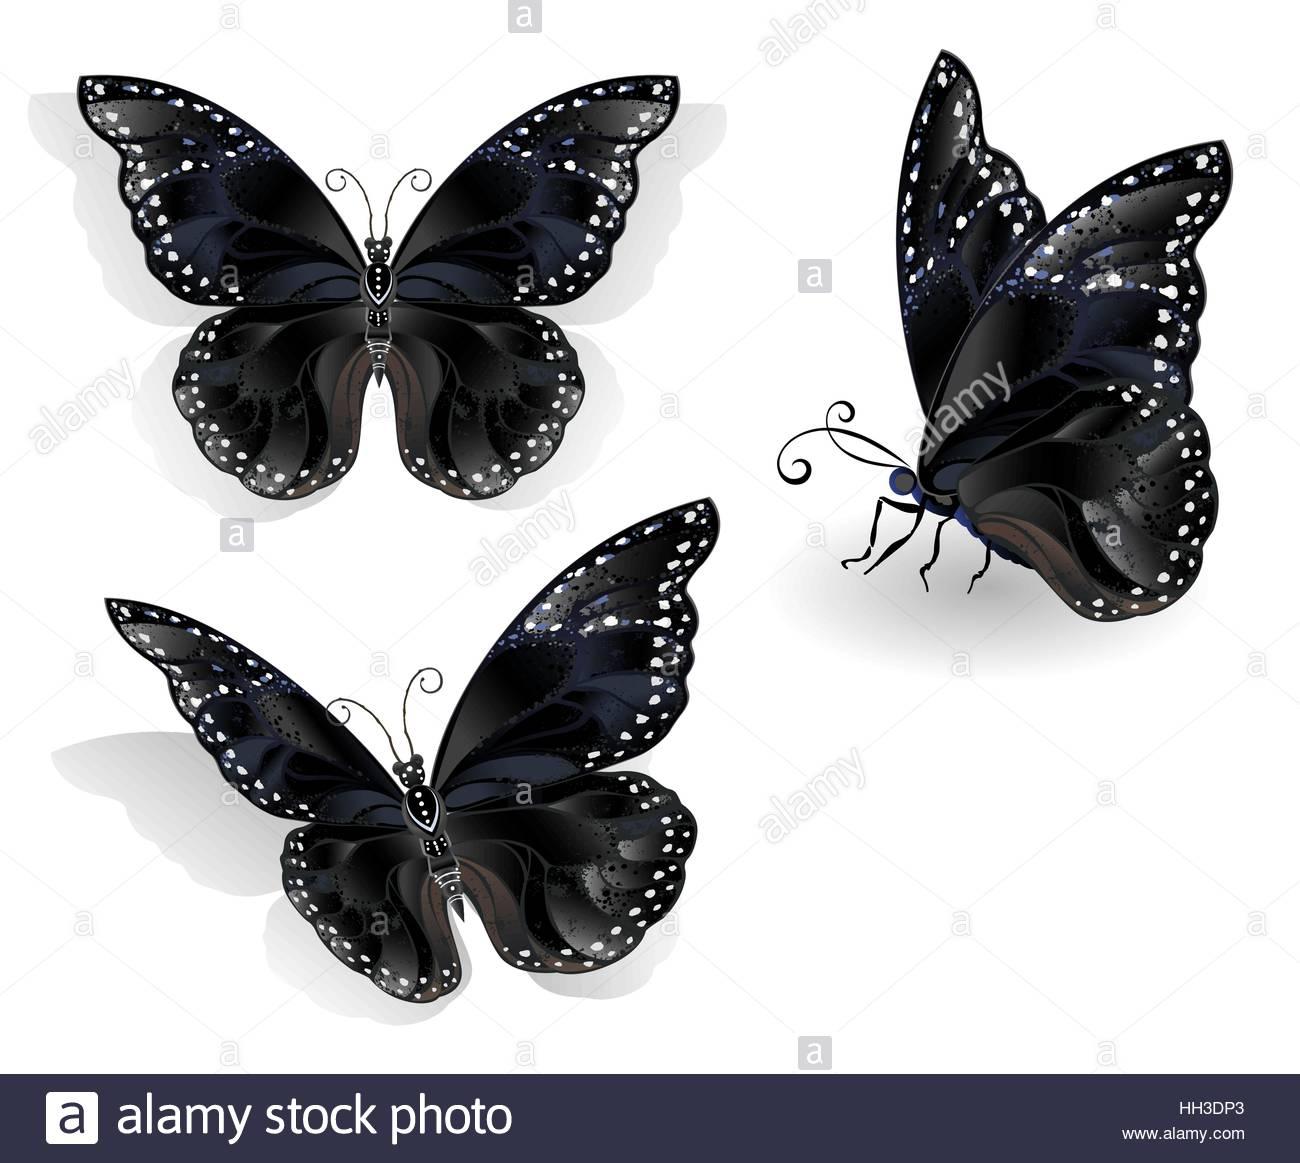 X´majaná o Mariposa Negra, Especie Endémica. CIENCIAS NATURALES Y ESPAÑOL